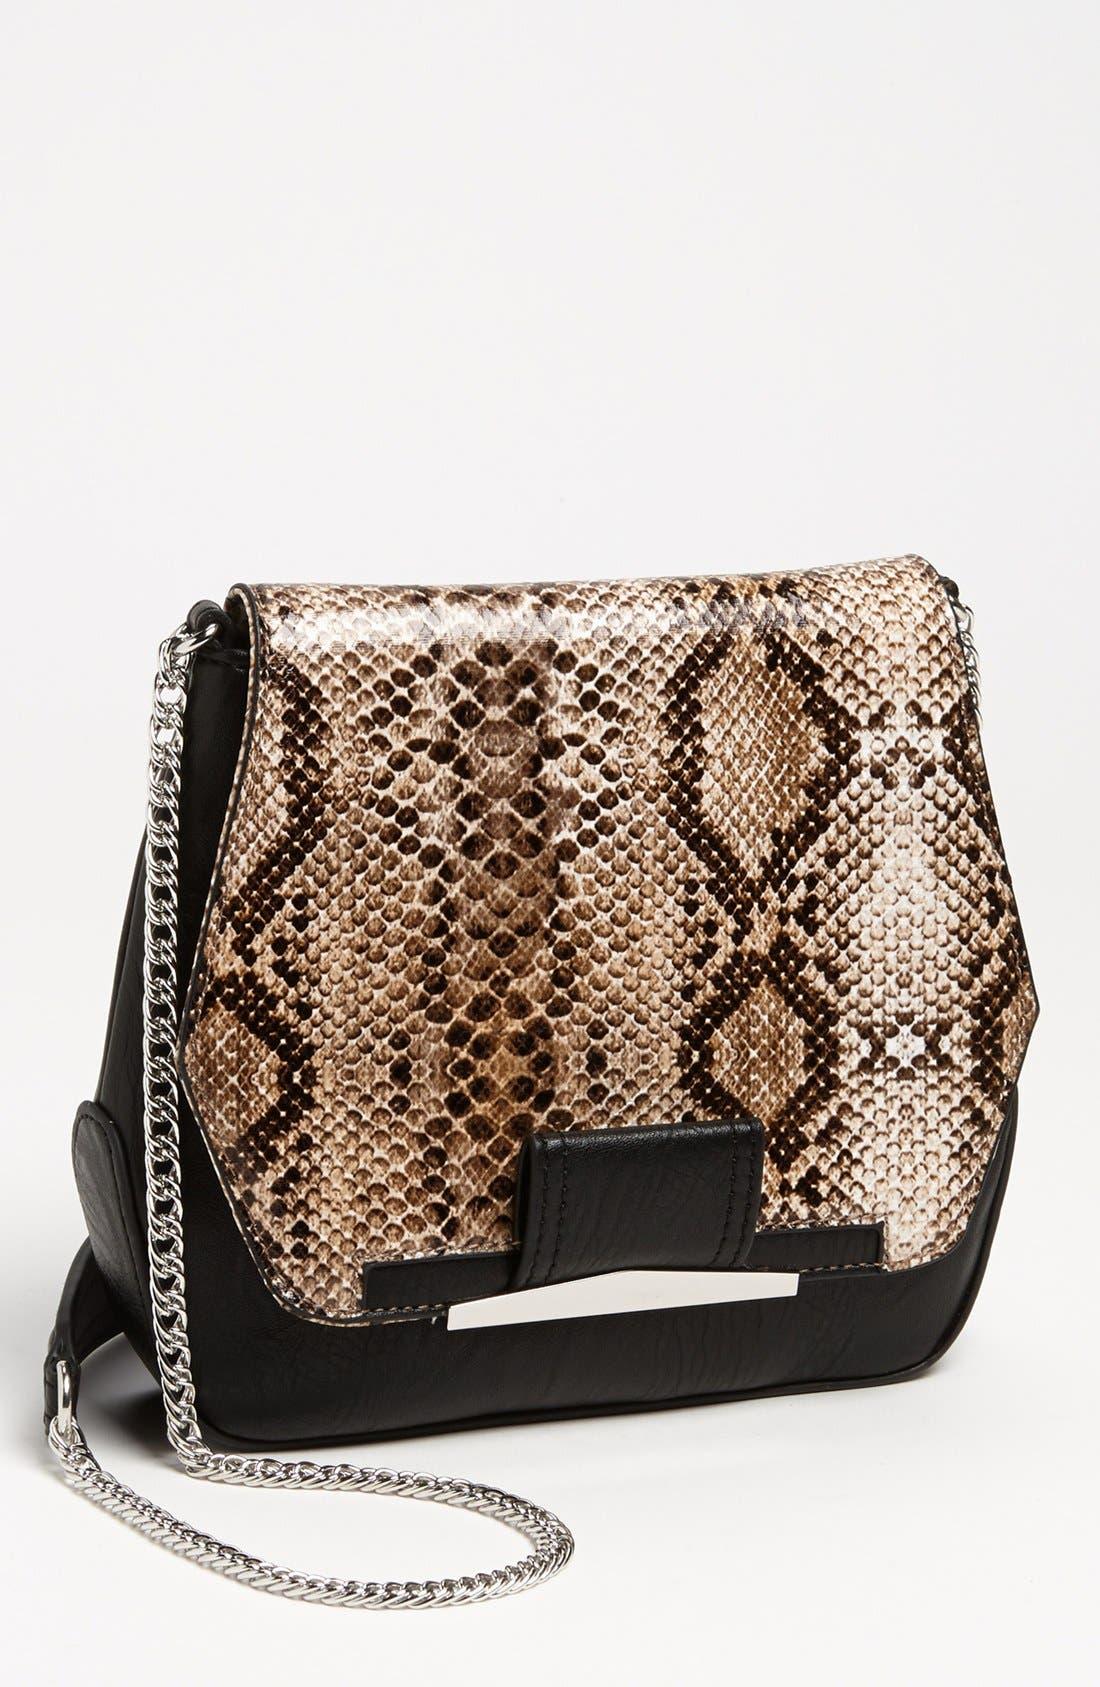 Main Image - Danielle Nicole 'Bella' Crossbody Bag